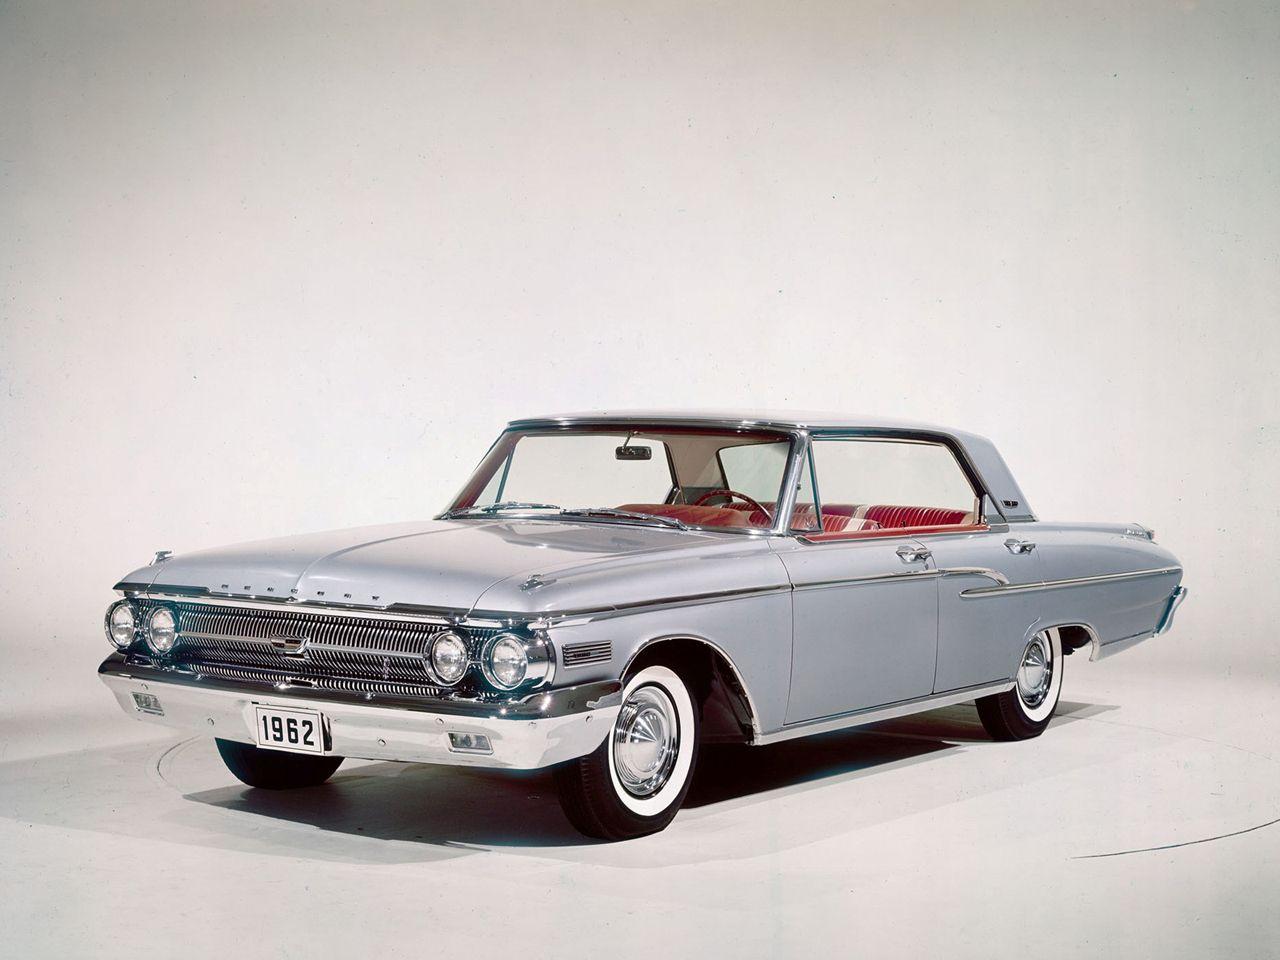 1962 mercury monterey hardtop sedan pistons pinterest sedans ford and cars. Black Bedroom Furniture Sets. Home Design Ideas